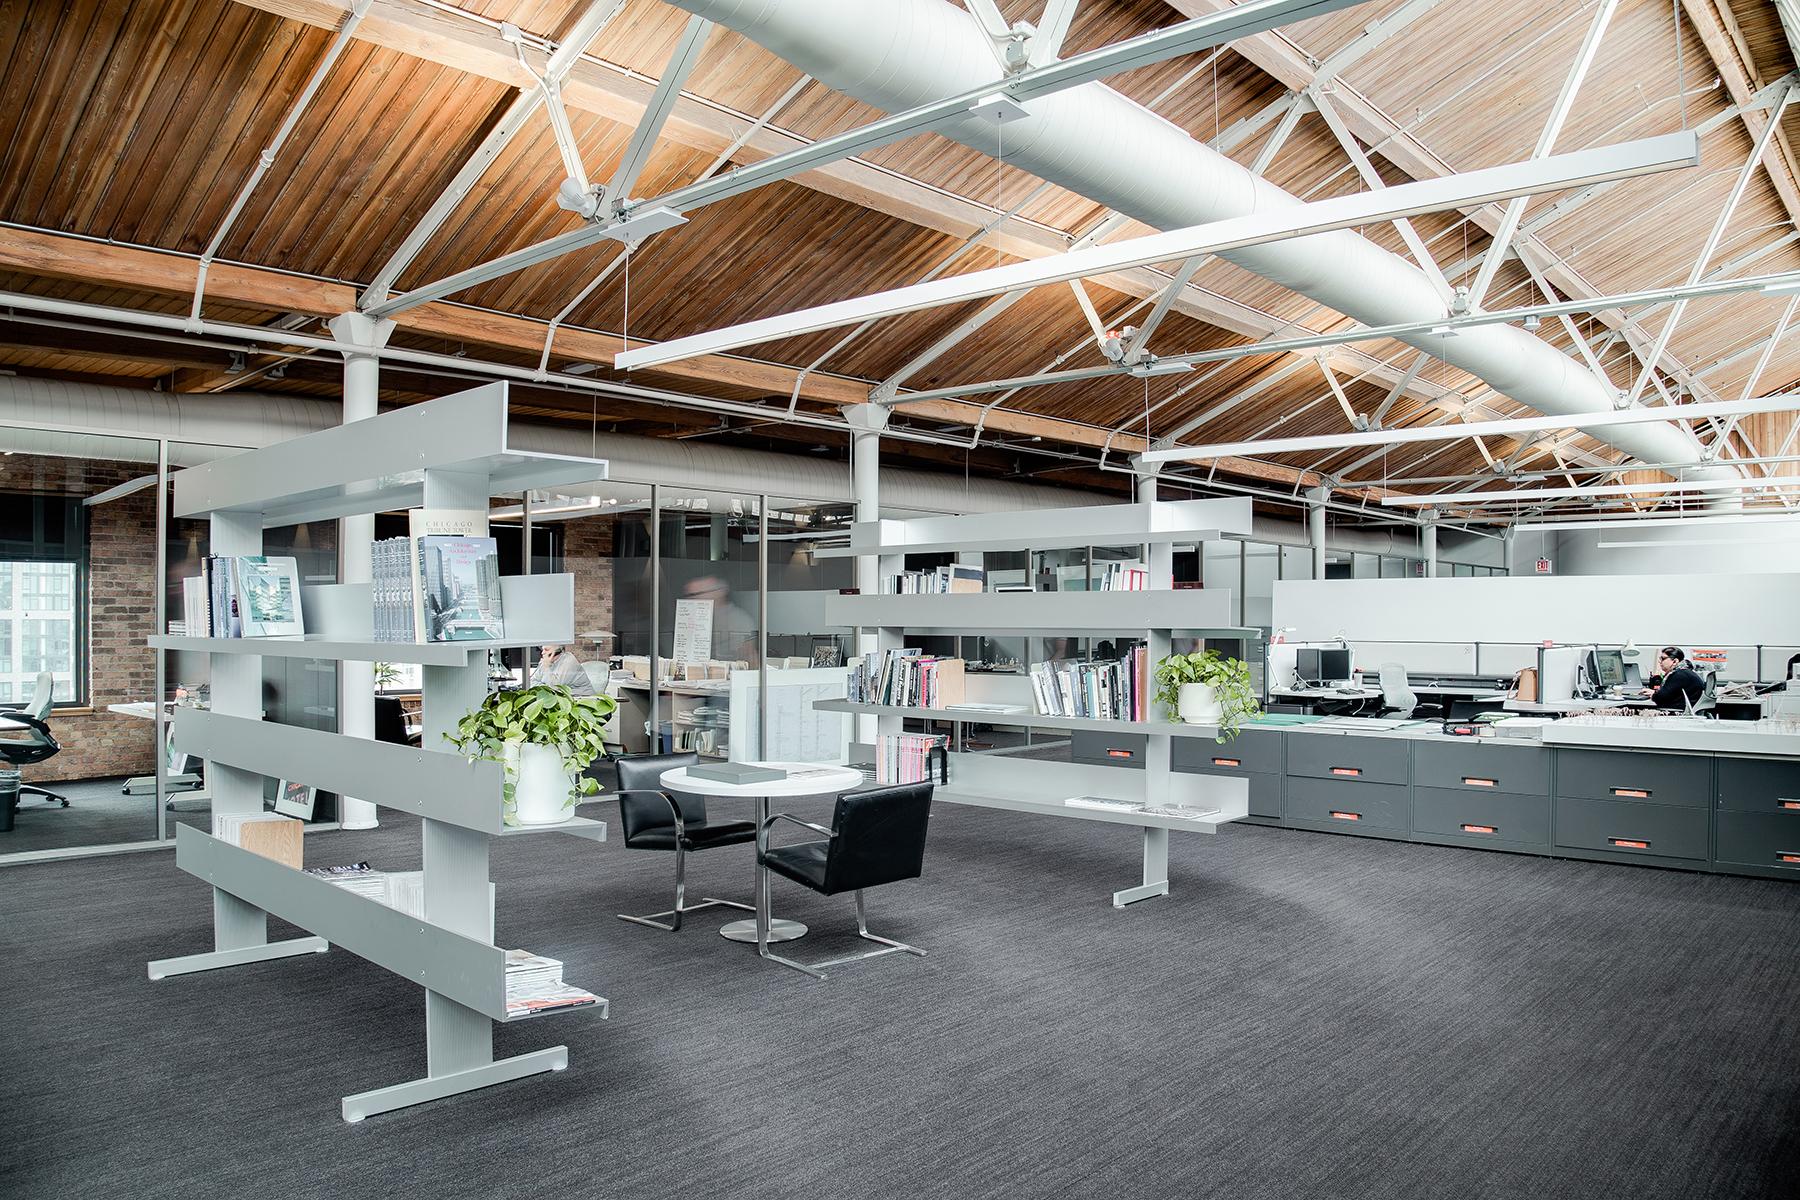 Design-Build Firms